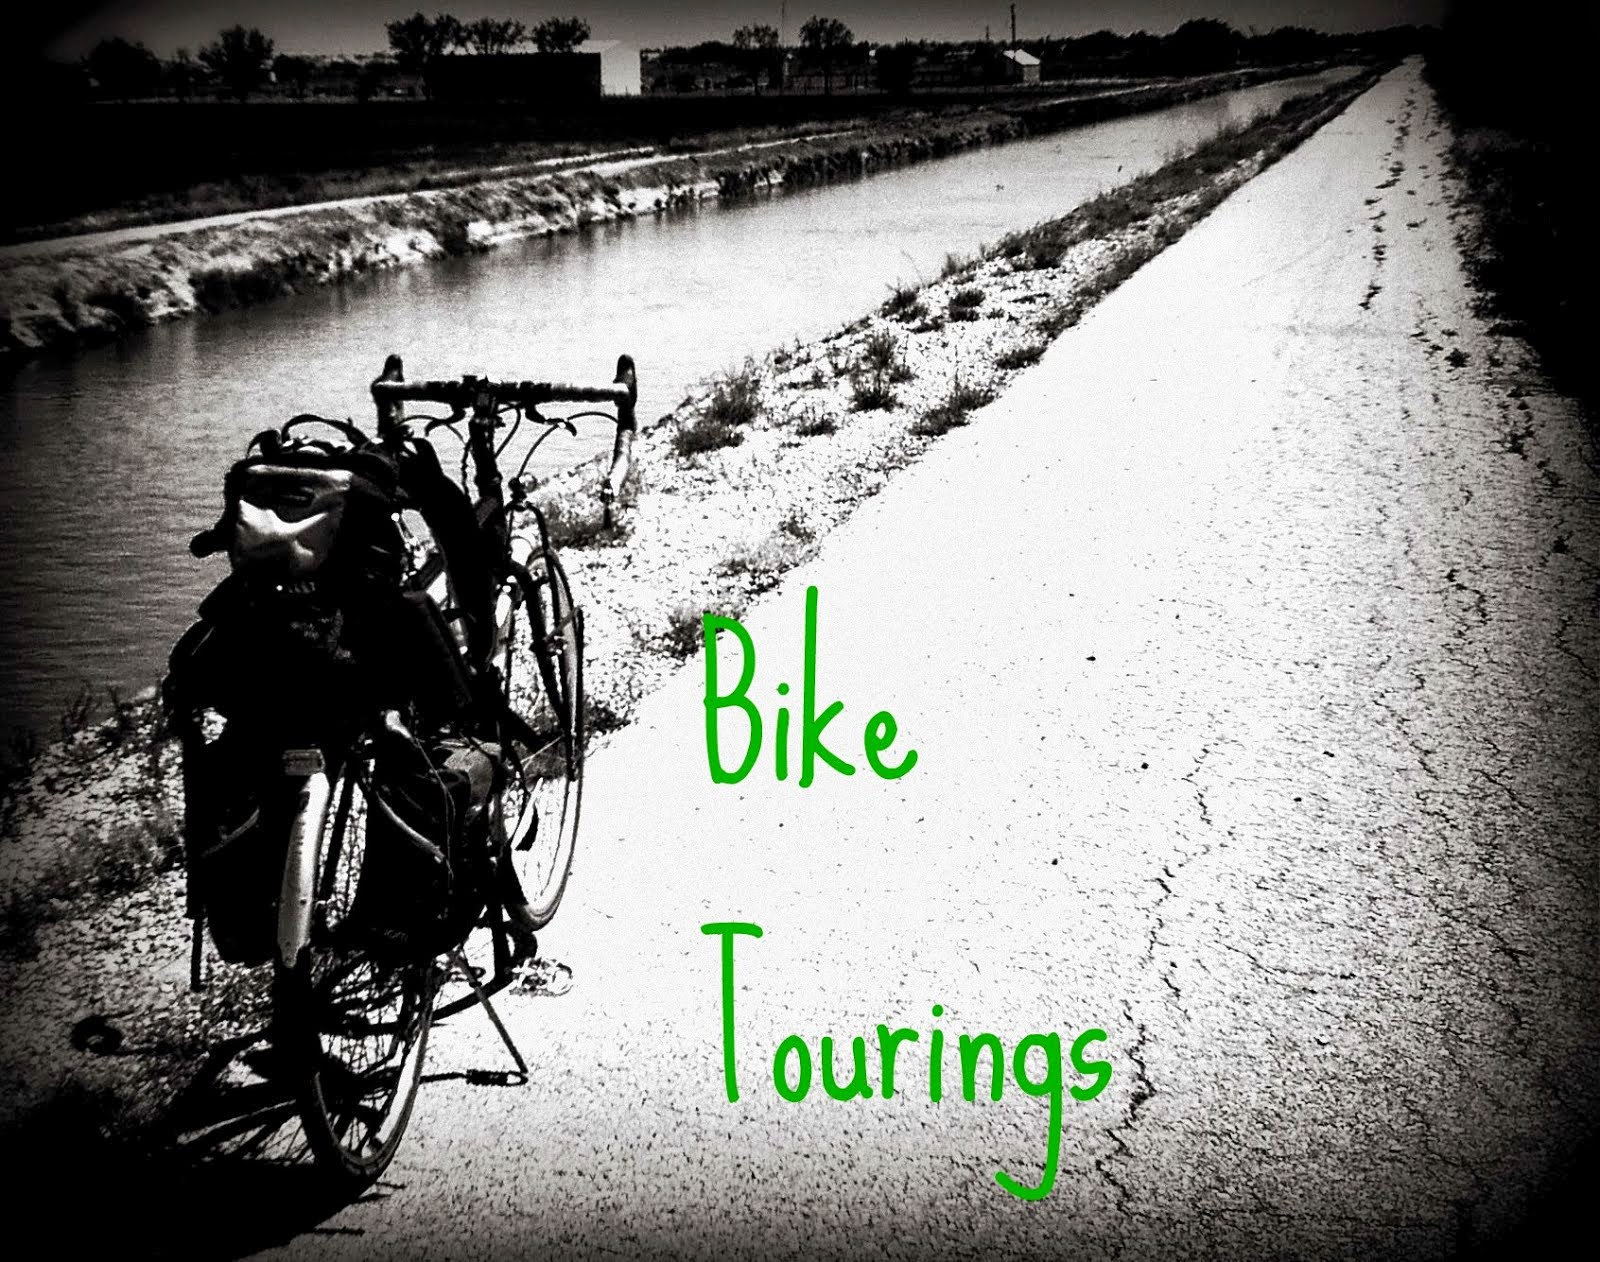 "<img src=""filename.gif"" alt=""visit biketourings.com"">"